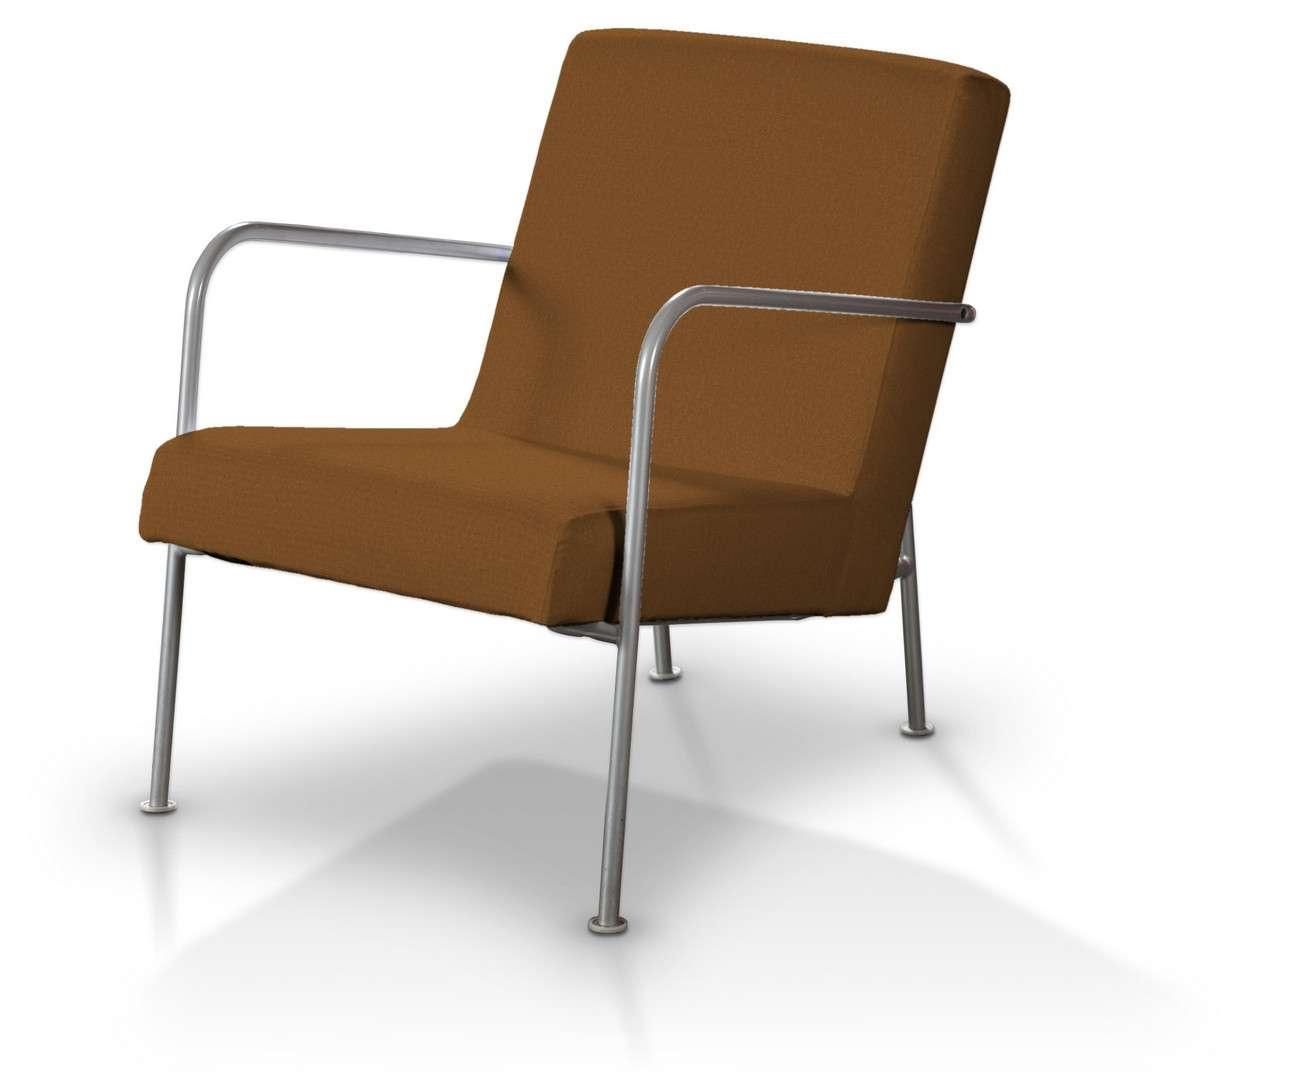 Potah na křeslo Ikea PS v kolekci Living II, látka: 161-28